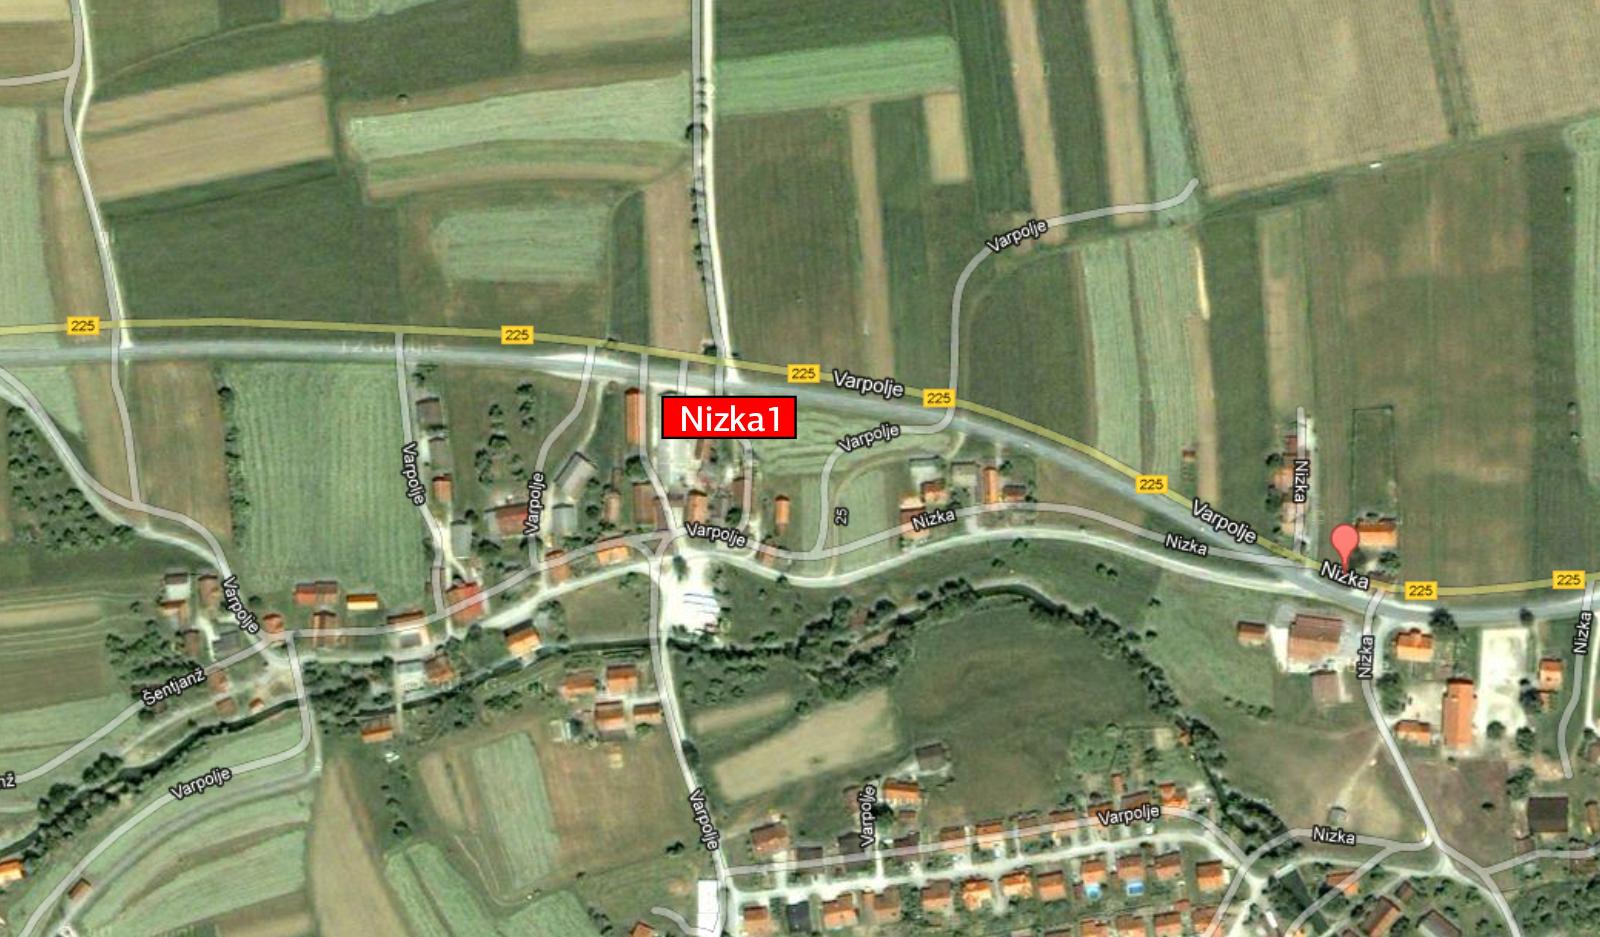 Oglaševanje na jumbo plakatih smer Celje - Logarska -Nizka1-lokacija - Zgornja Savinjska Dolina